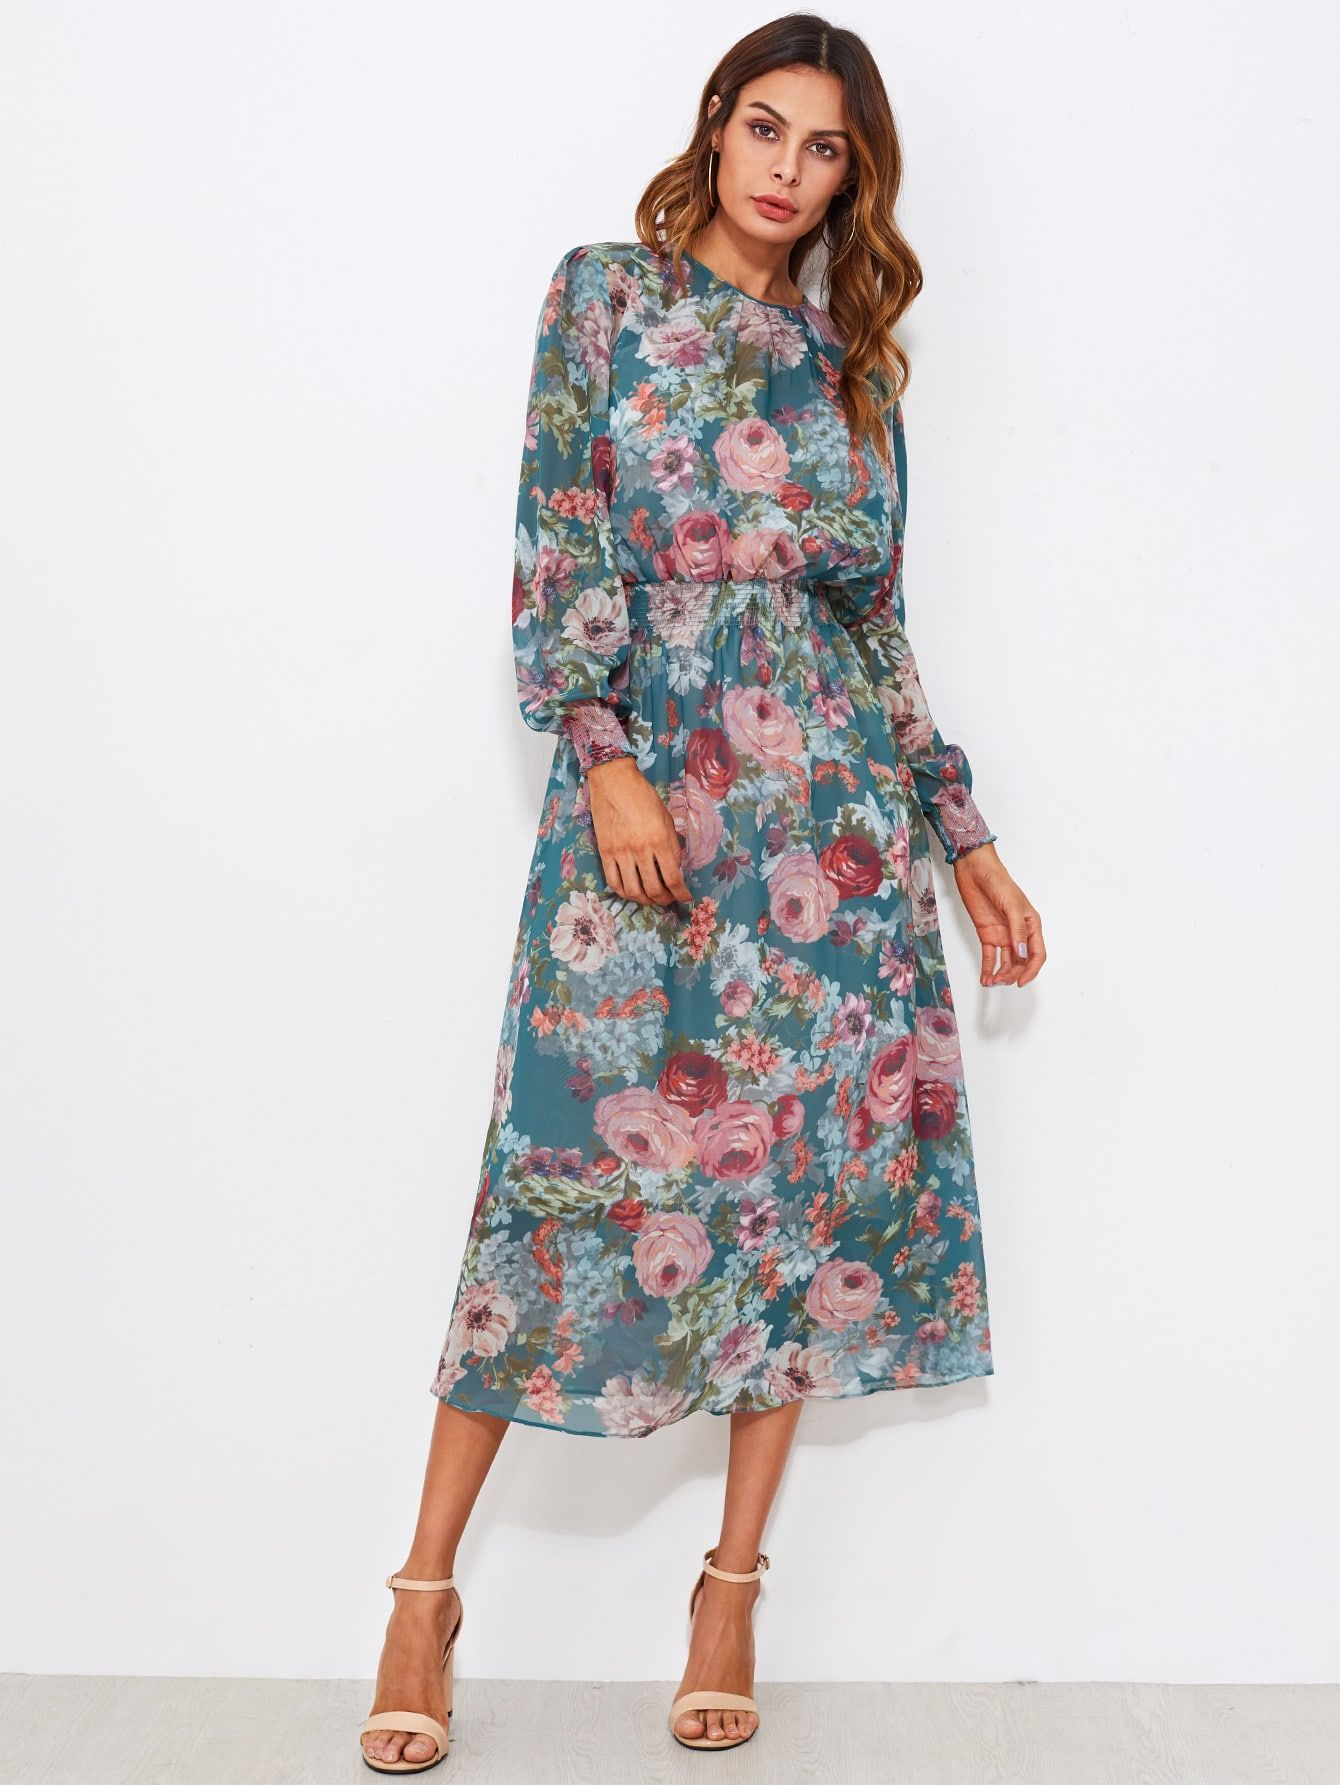 Smocked Trim Calico Print Midi Dress 2019 Elbiseler Kiyafet Ve Elbise Modelleri